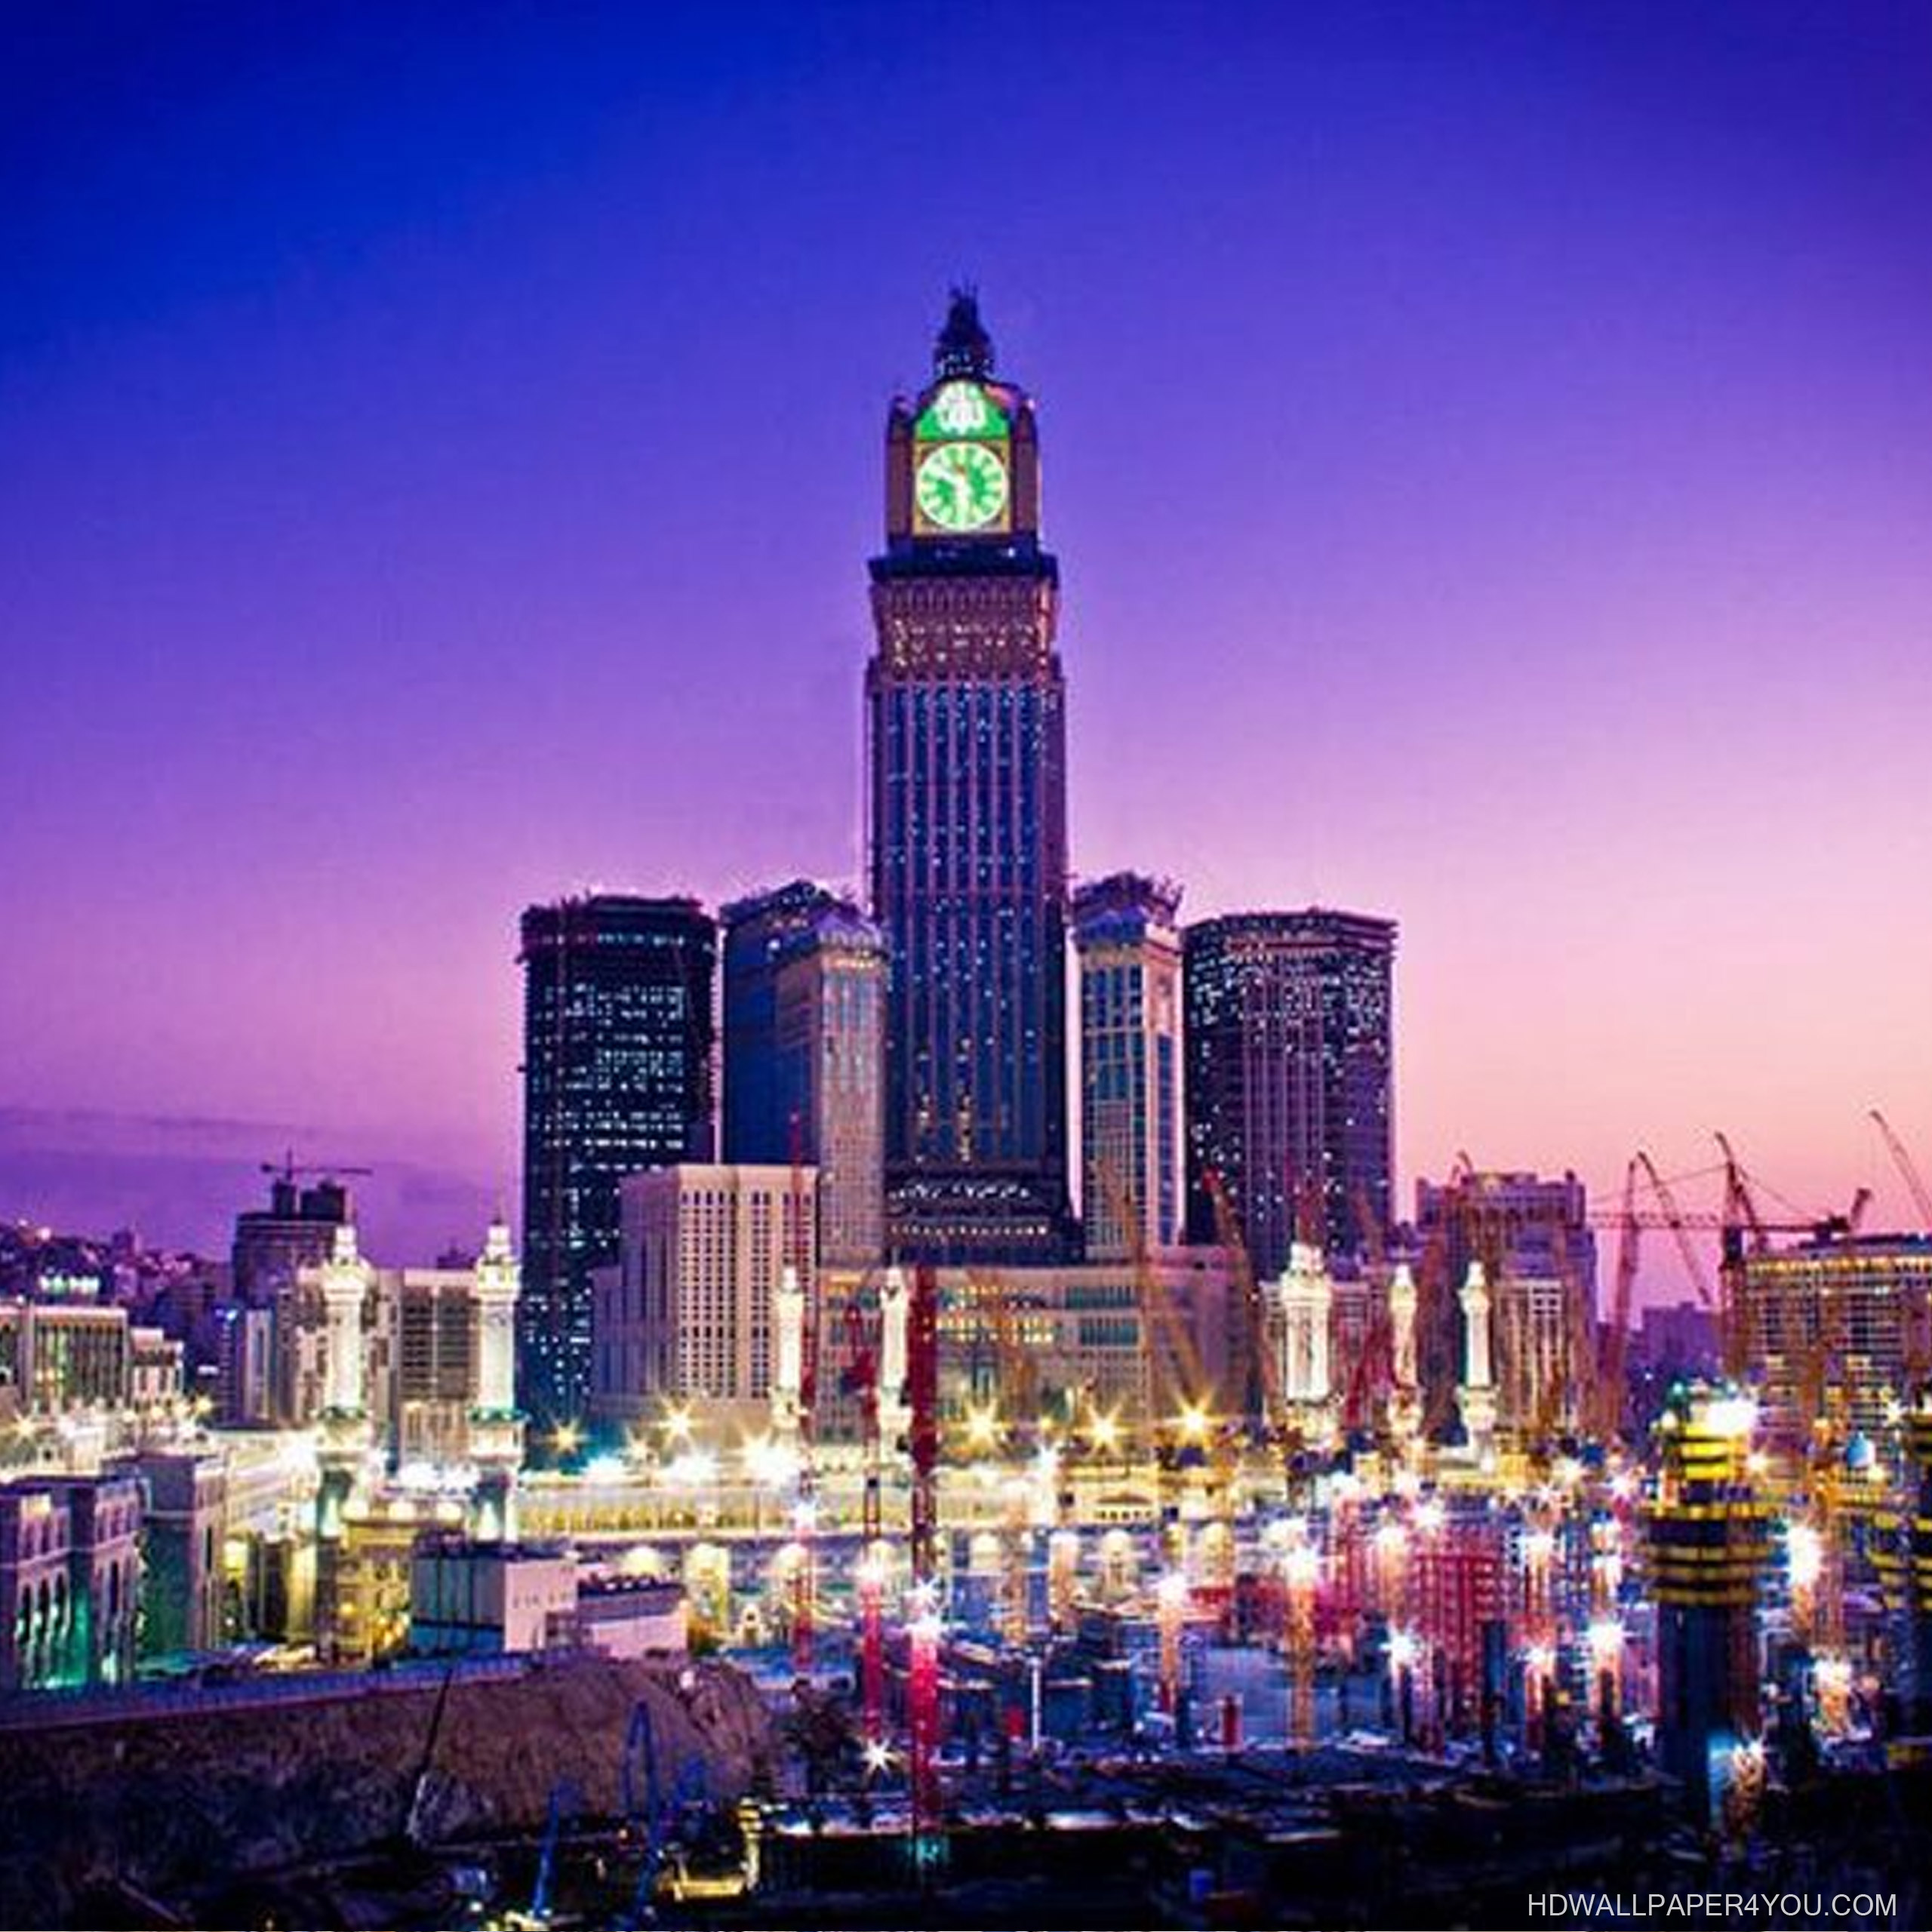 Samsung Wallpaper Hd 1080p 2017 خلفيات دينية ساعة مكة المكرمة Islamic Wallpapers صور